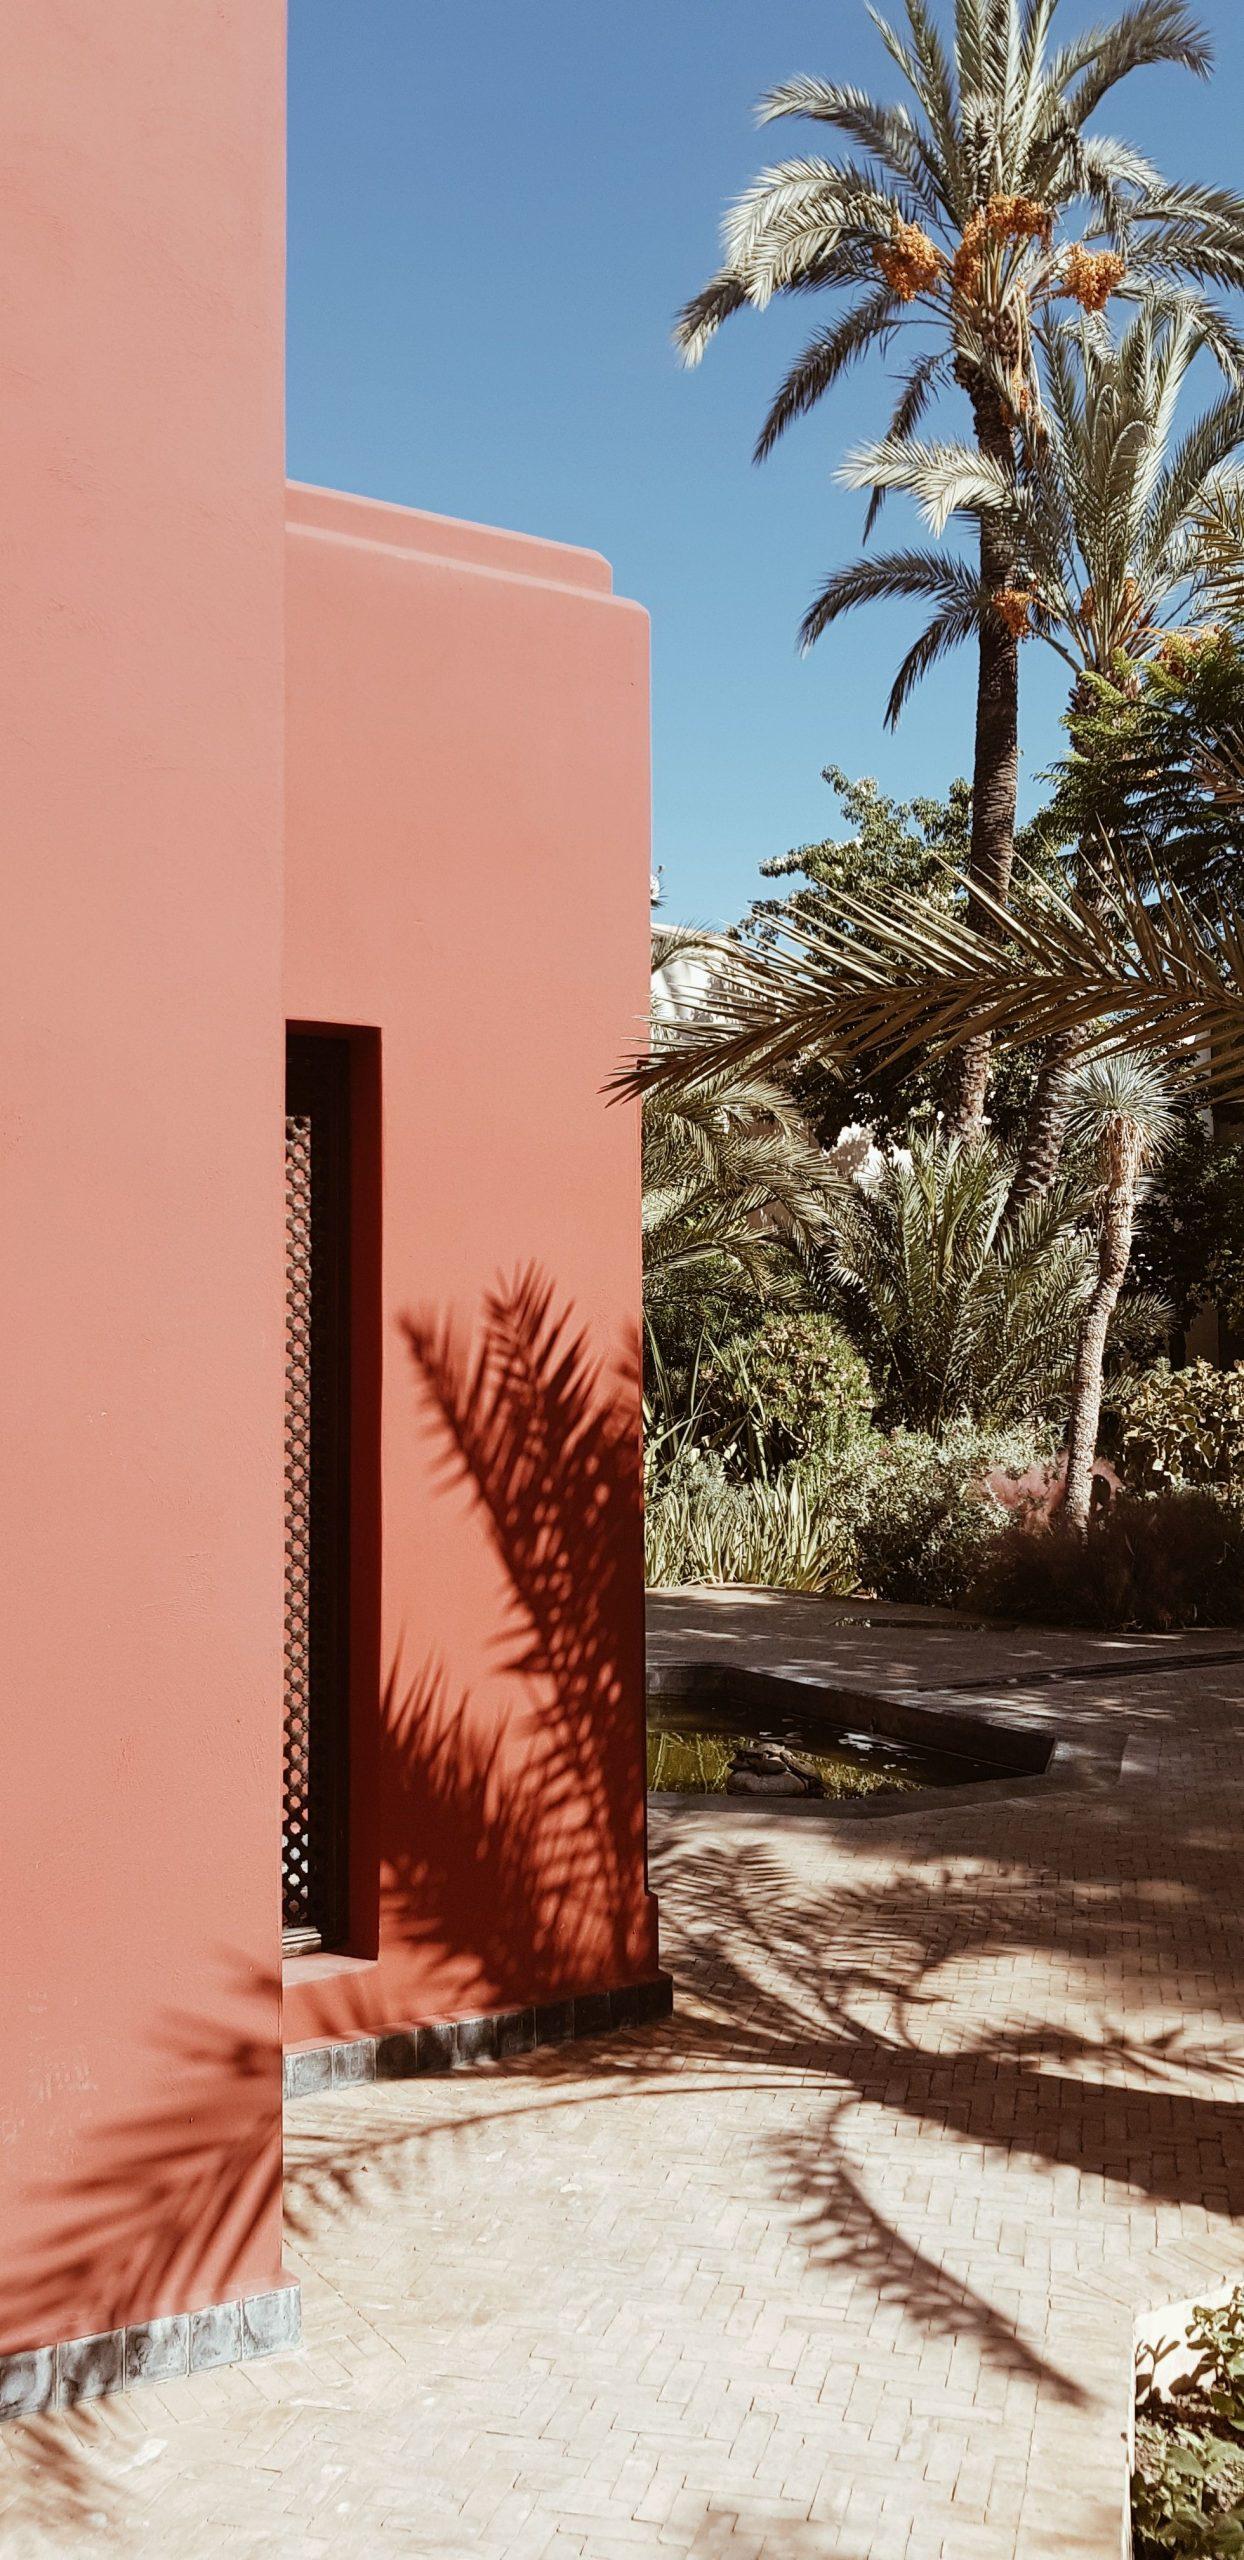 Charmiga uteplatsdesigner i Marocko